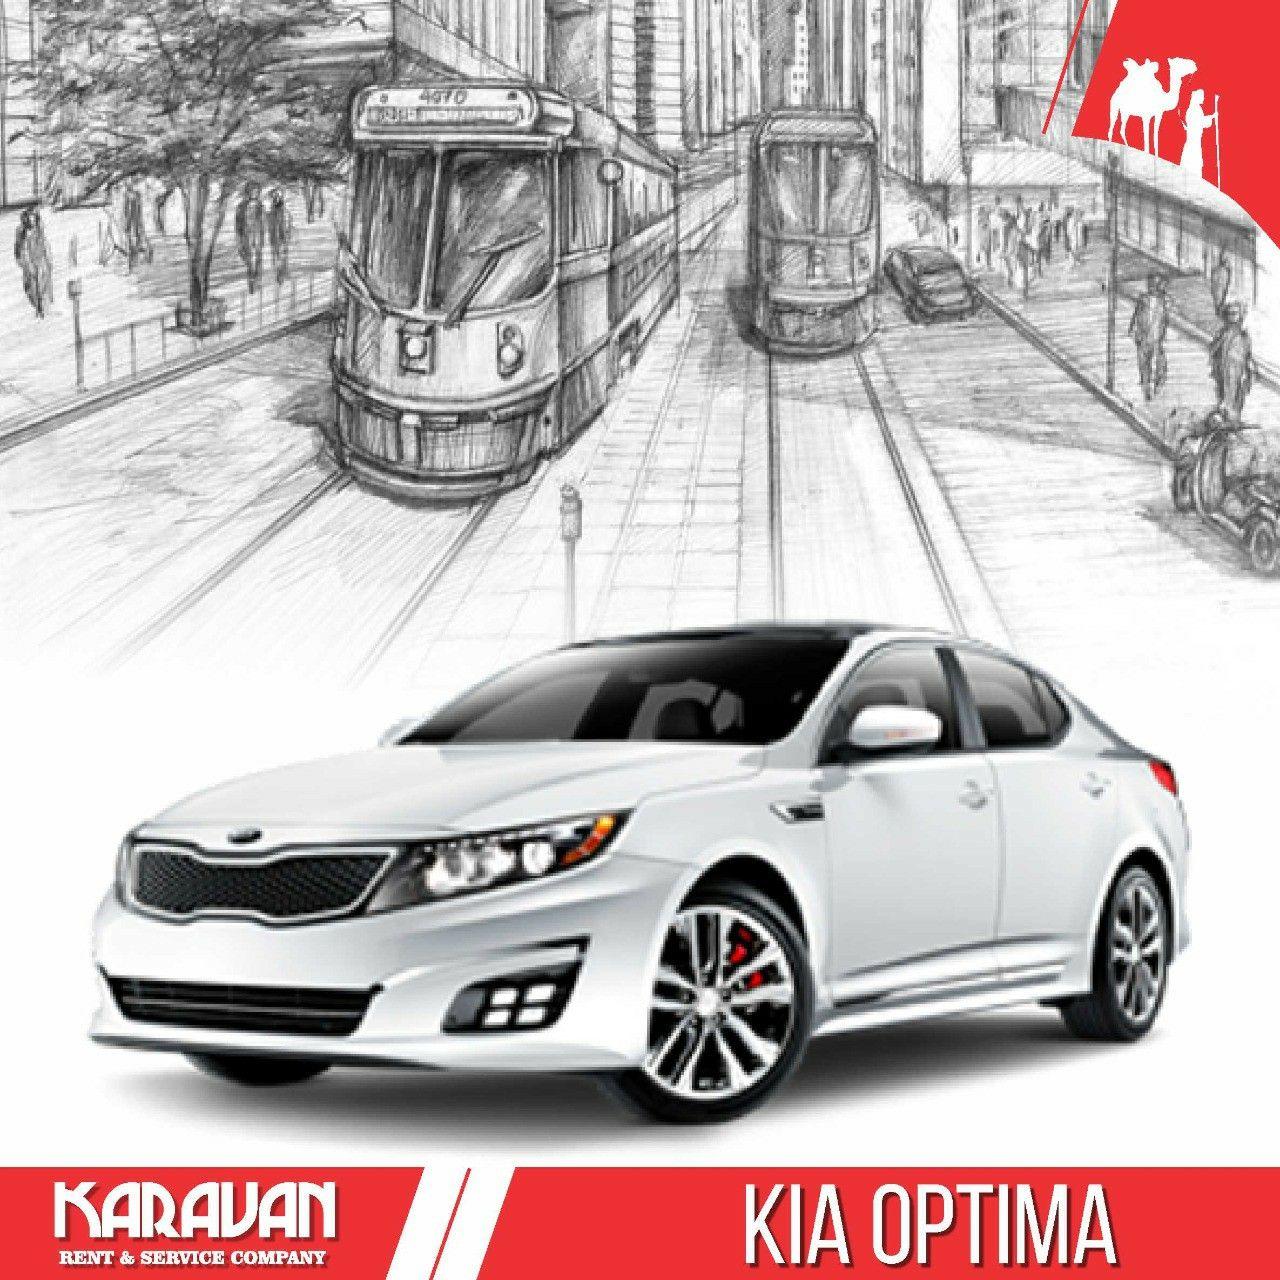 Kia Optima  #rentacarbaku #rentacar #baku #azerbaycan #carhirebaku